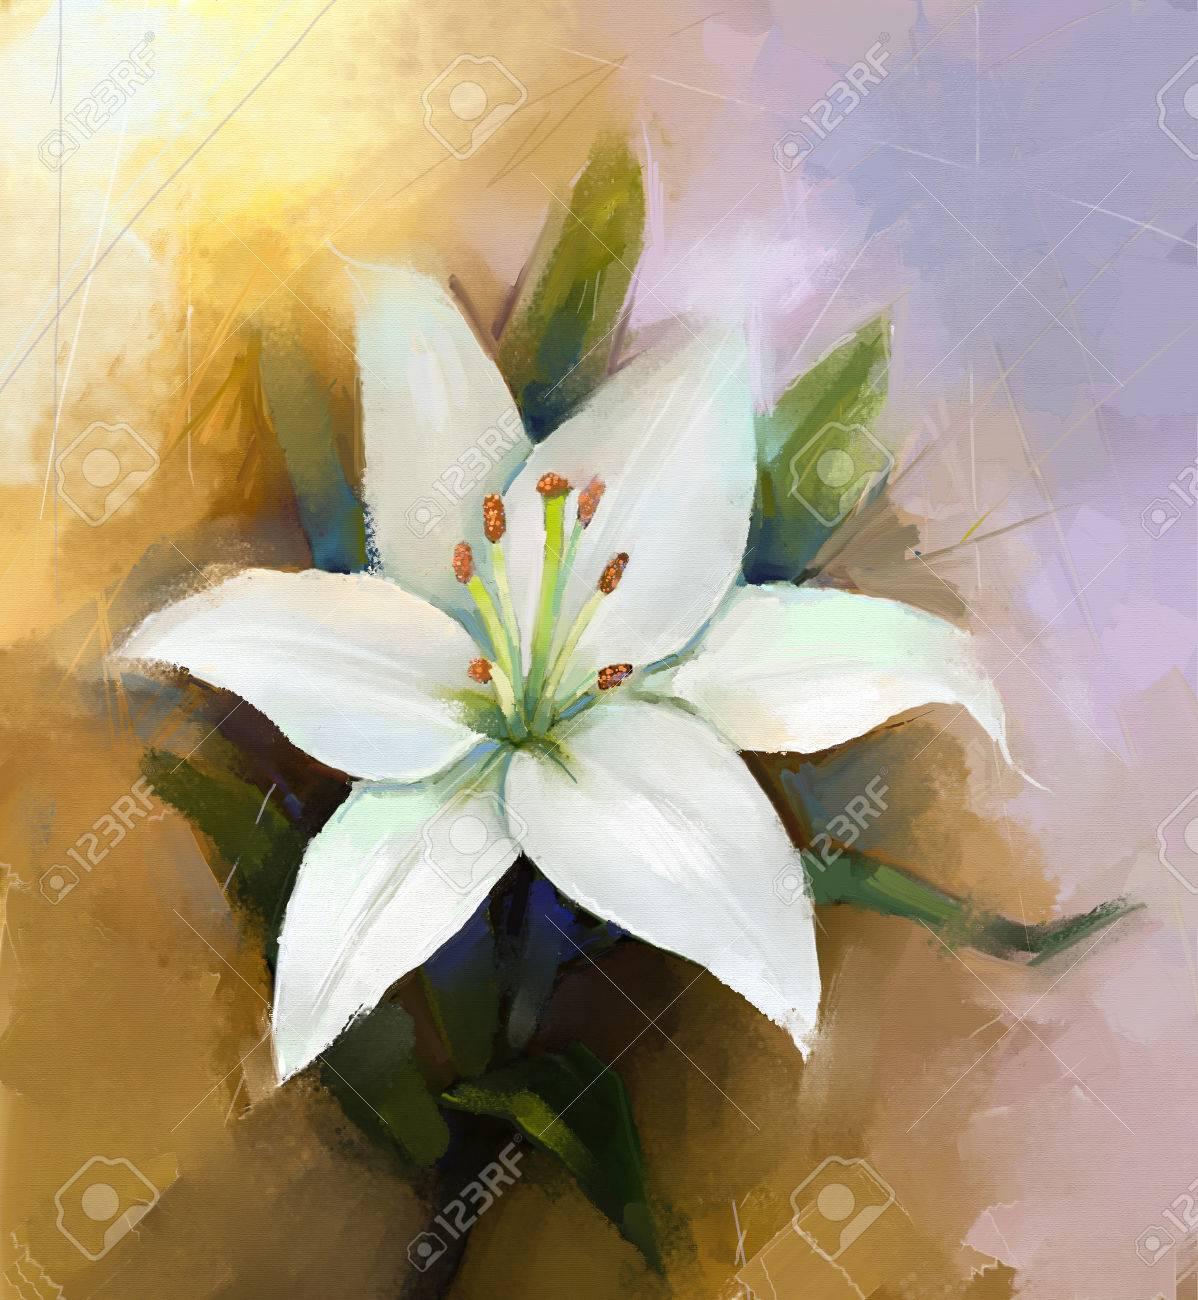 White lily flowerflower oil painting stock photo picture and stock photo white lily flowerflower oil painting izmirmasajfo